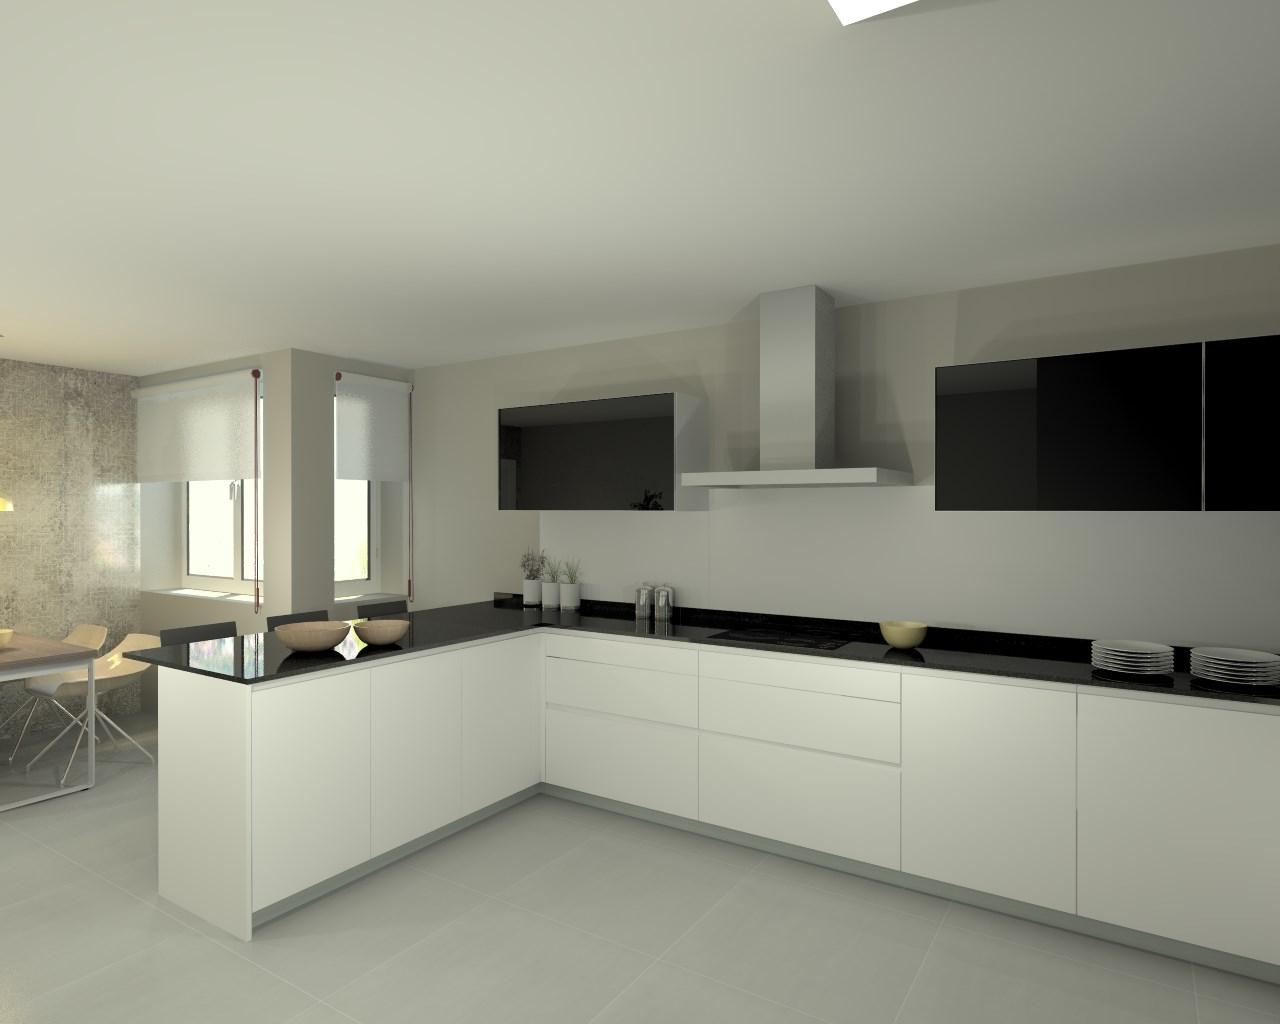 Aravaca cocina santos modelo line e blanco encimera for Modelos de marmol para cocina